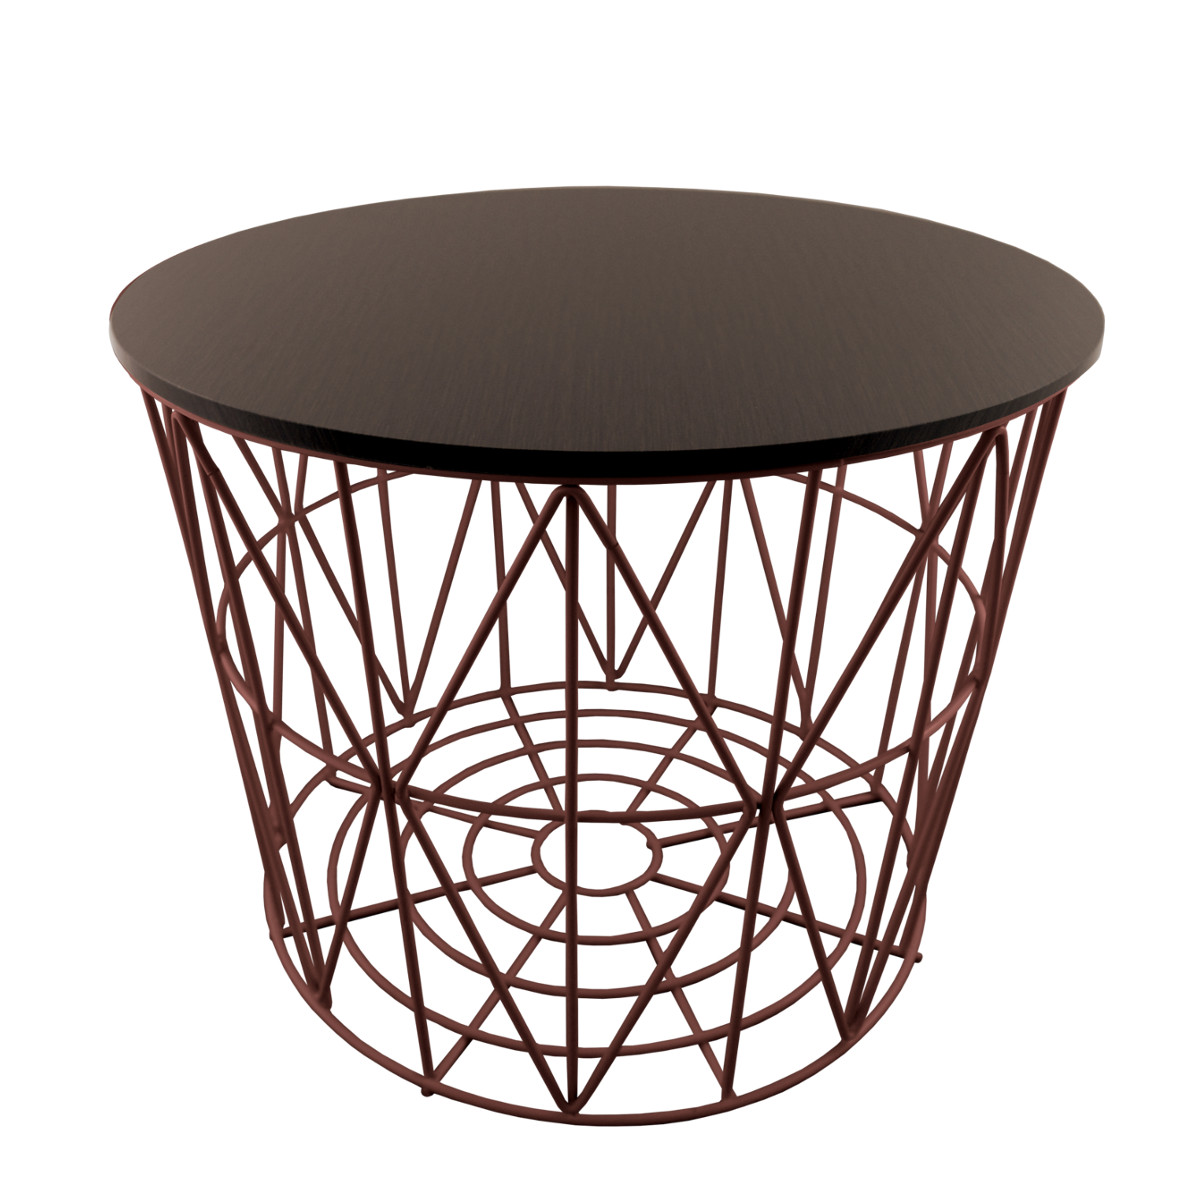 primoliving design drahtk rbe in 4 gr en drahtkorb tisch korb mit deckel braun ebay. Black Bedroom Furniture Sets. Home Design Ideas